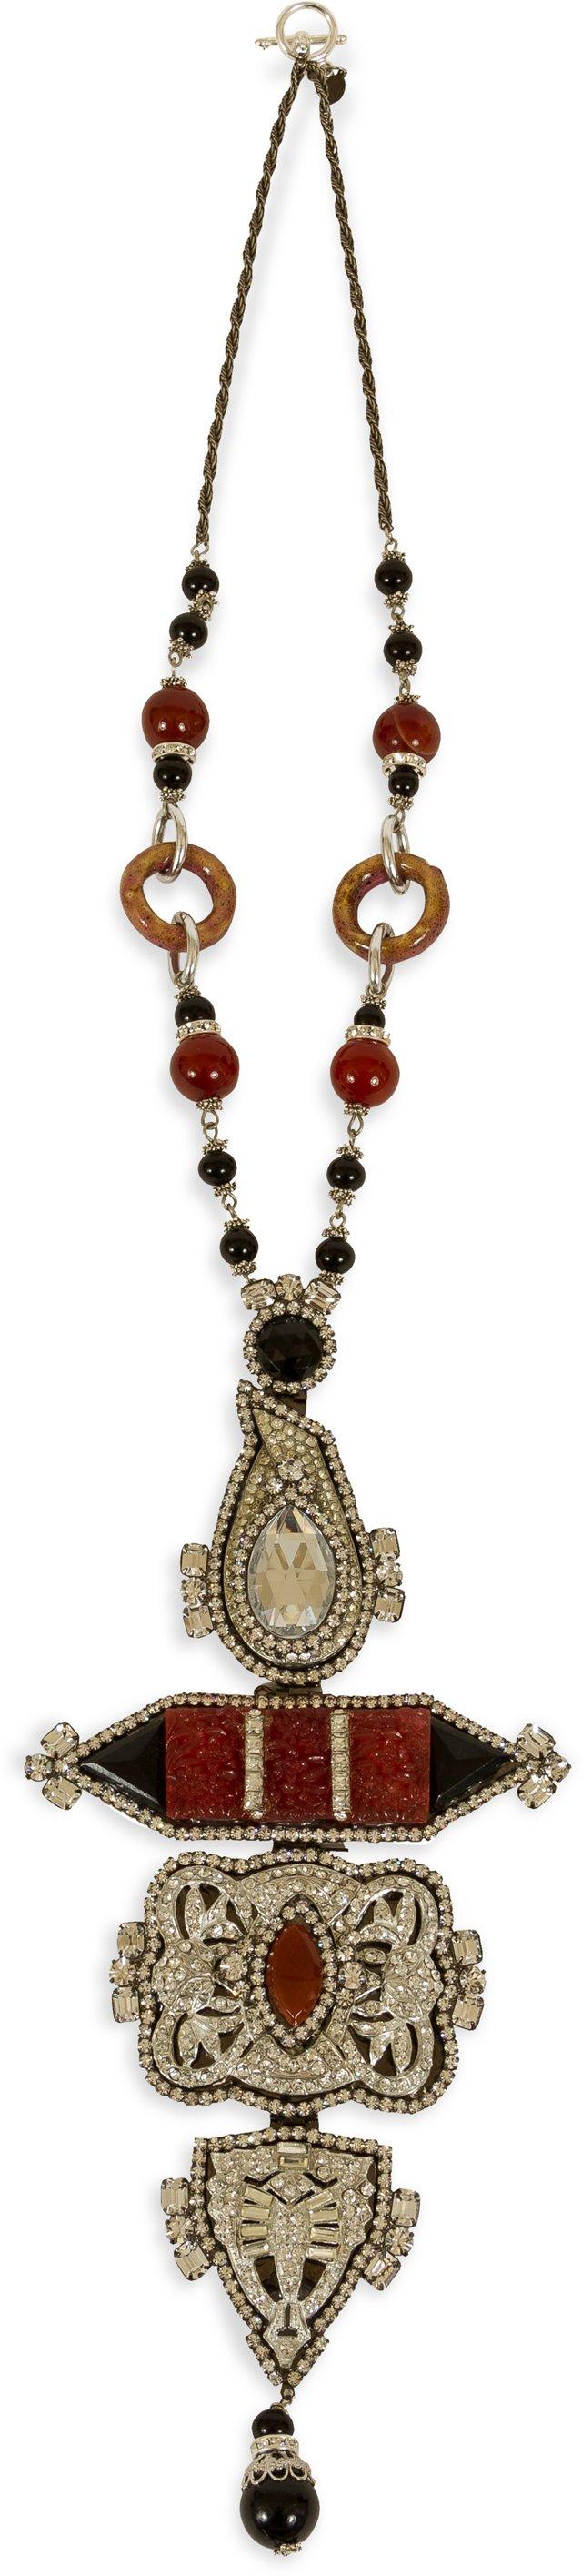 Lawrence Vrba Art Deco-Style Necklace